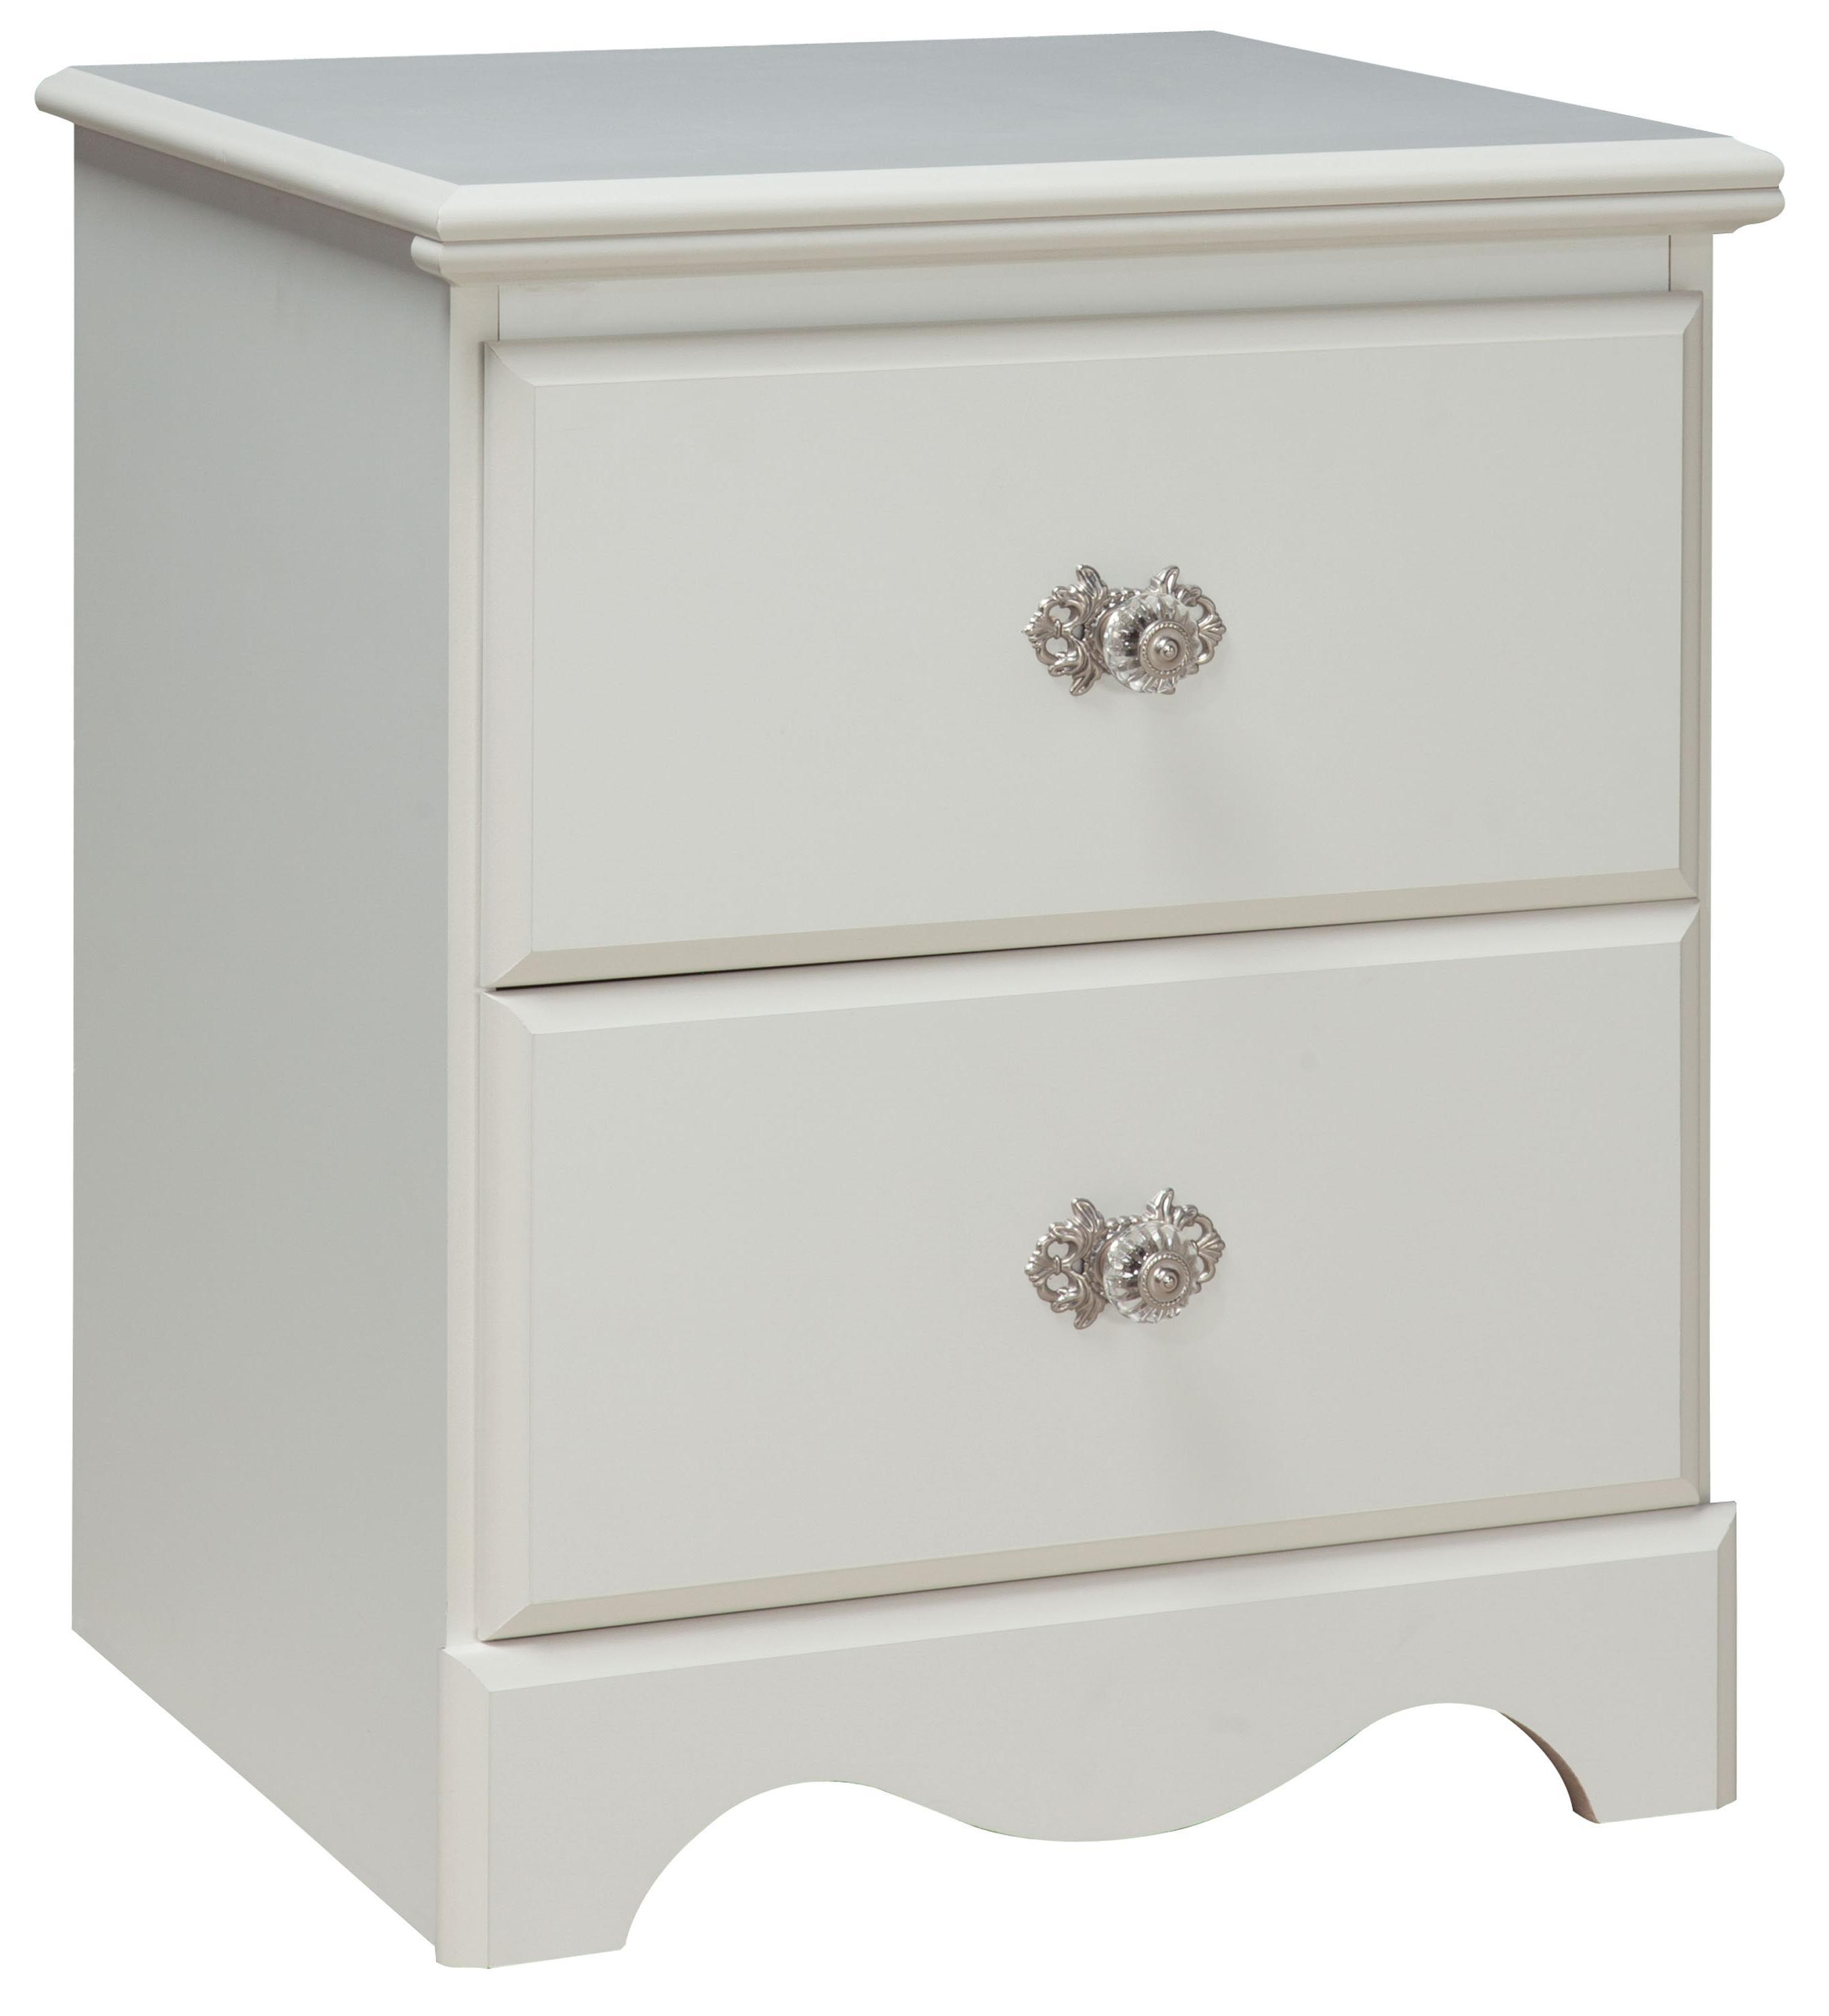 Standard Furniture Daphne Nightstand - Item Number: 65557